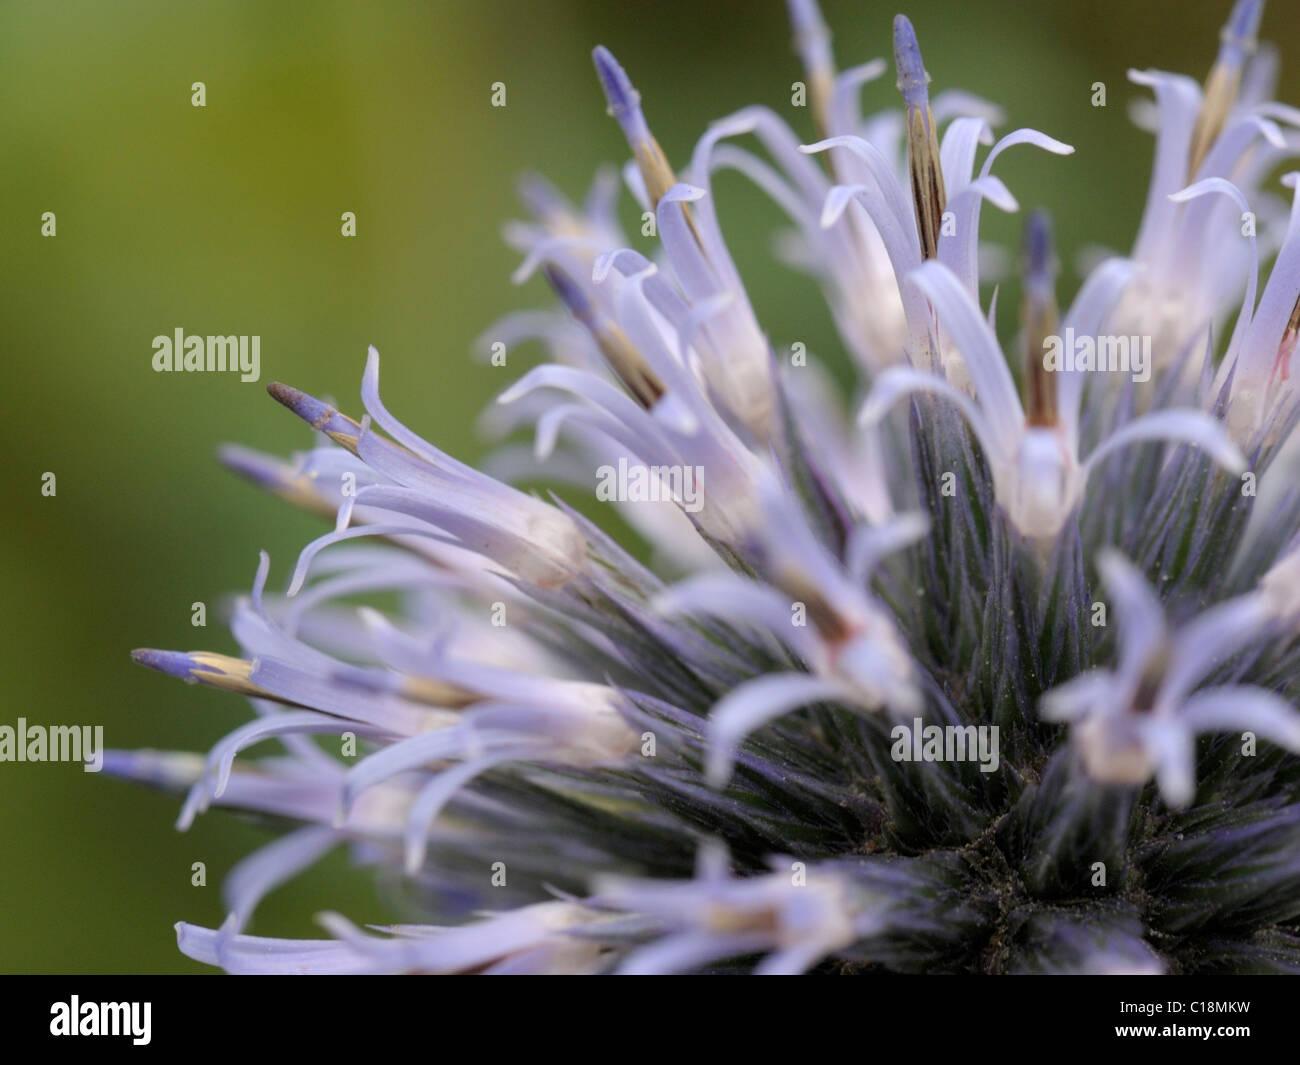 Blue Globe-thistle, echinops bannaticus - Stock Image